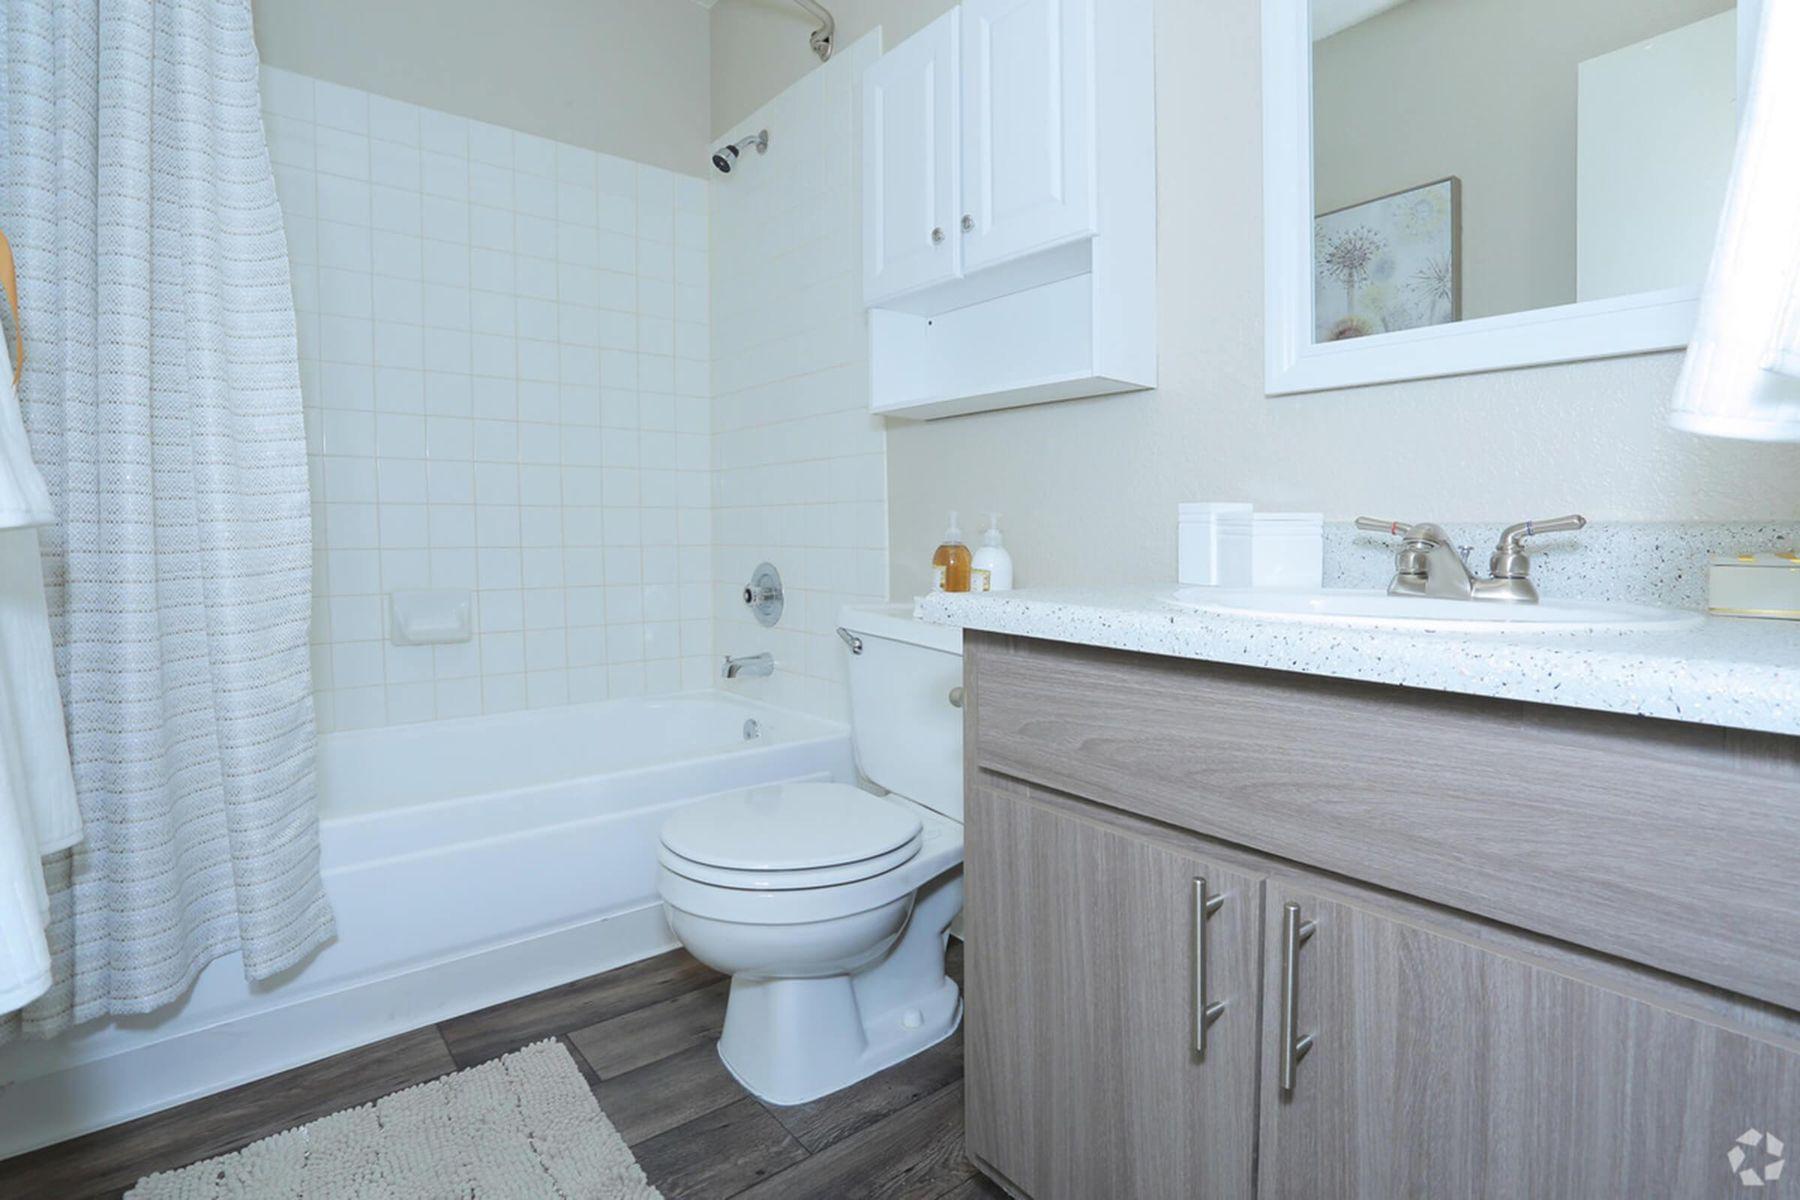 sunset-hills-apartments-henderson-nv-2br-2ba---960-sf-master-bathroom.jpg